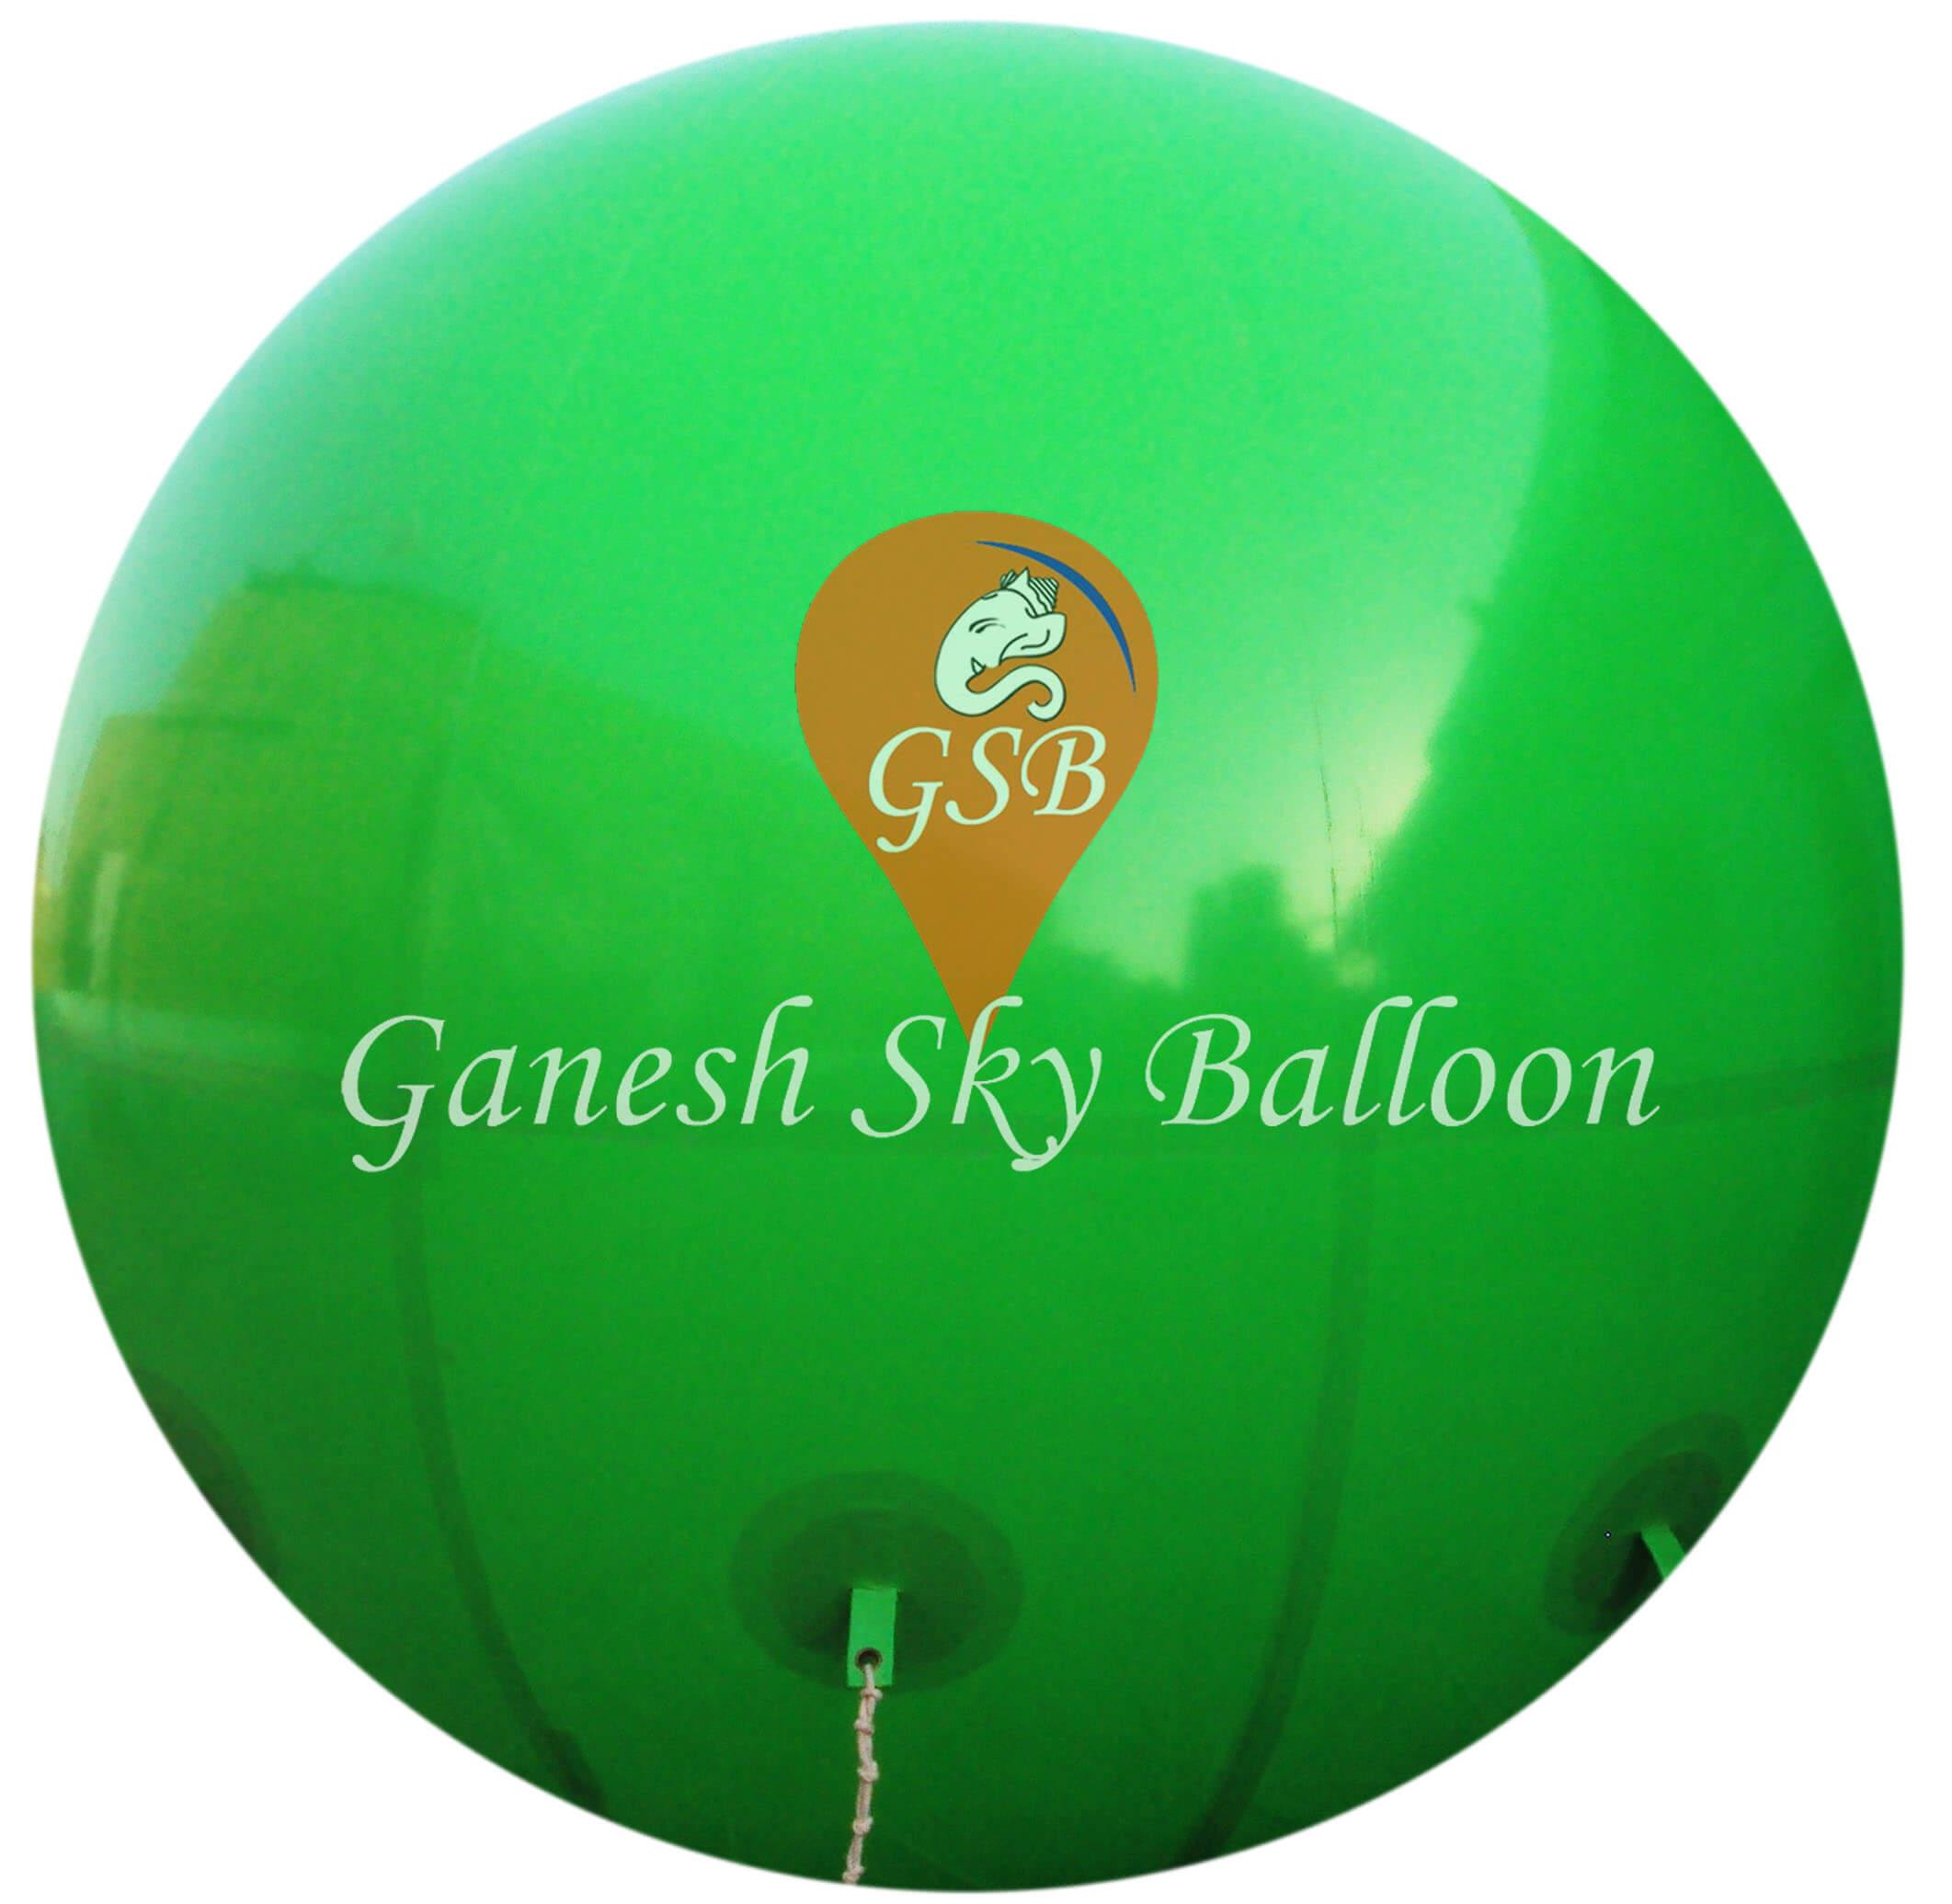 Voting Sky Balloon